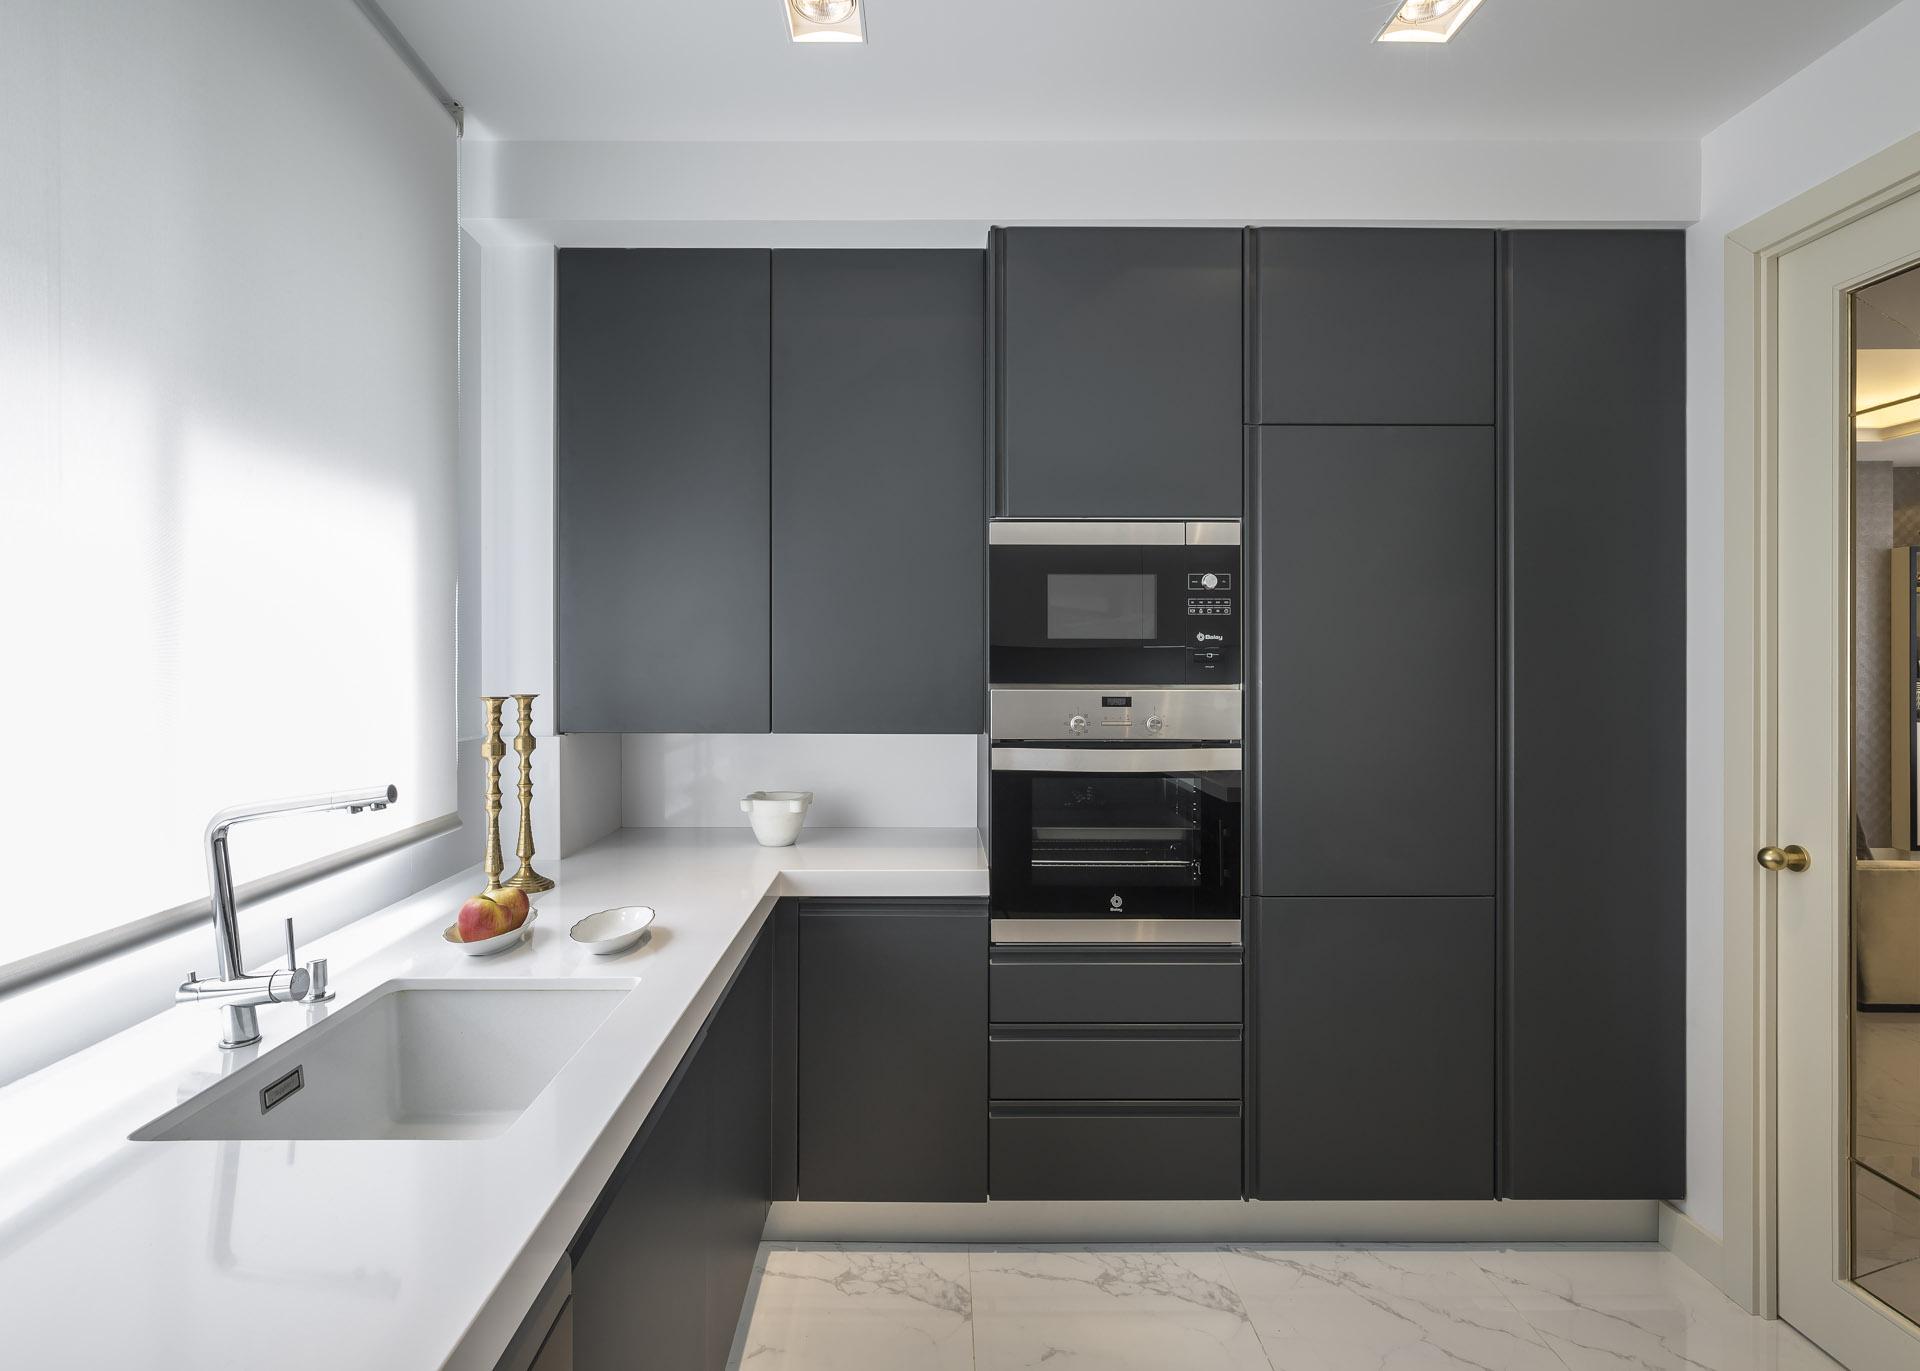 fotografia-arquitectura-valencia-interiorismo-german-cabo-laura-yerpes-apartamento-10